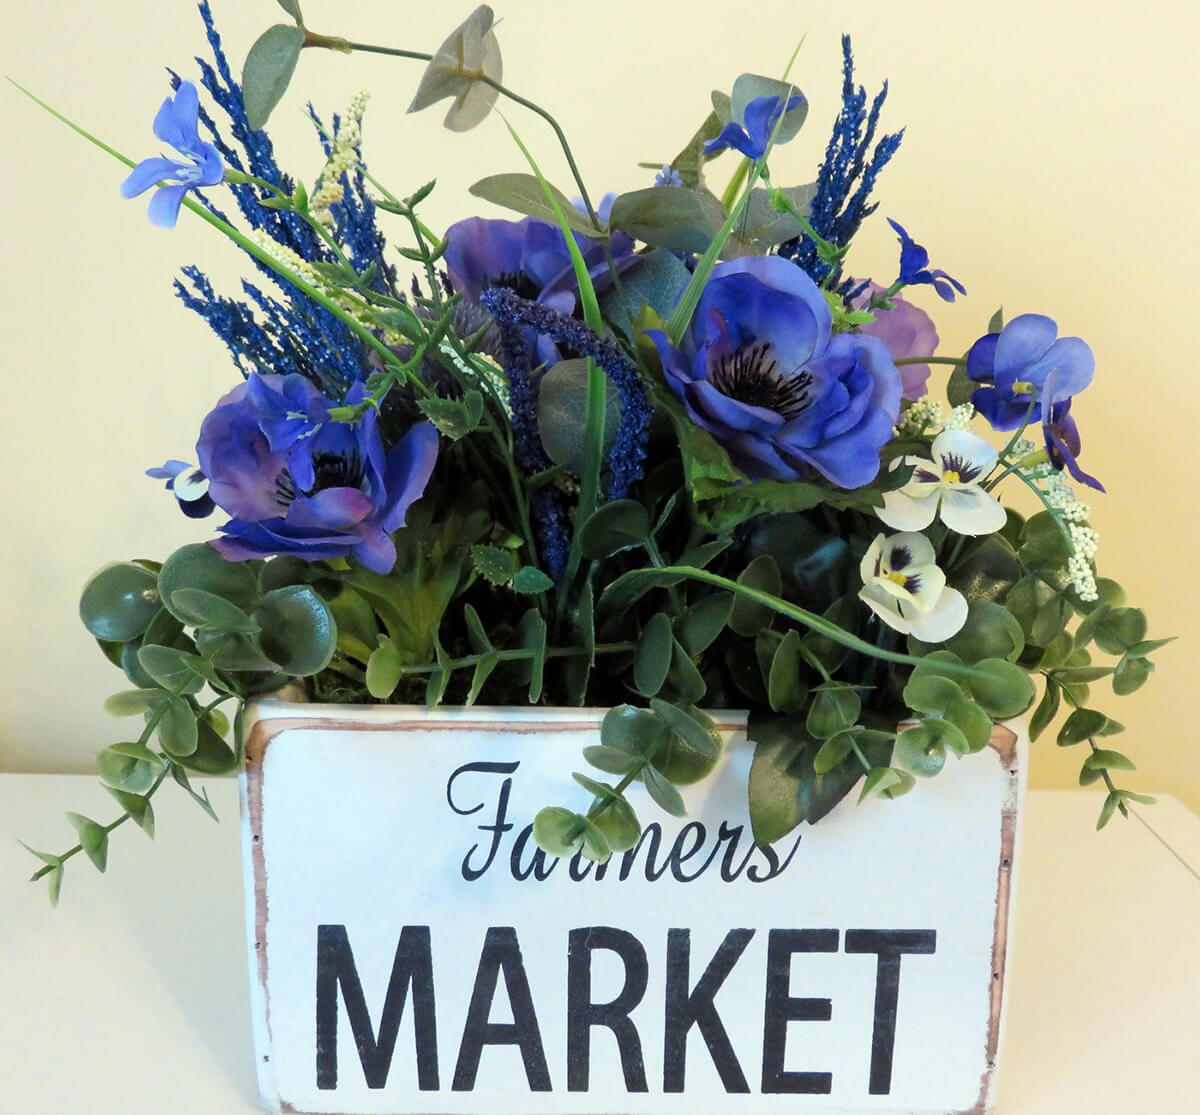 A Brilliant Bouquet of Farmer's Market Flowers